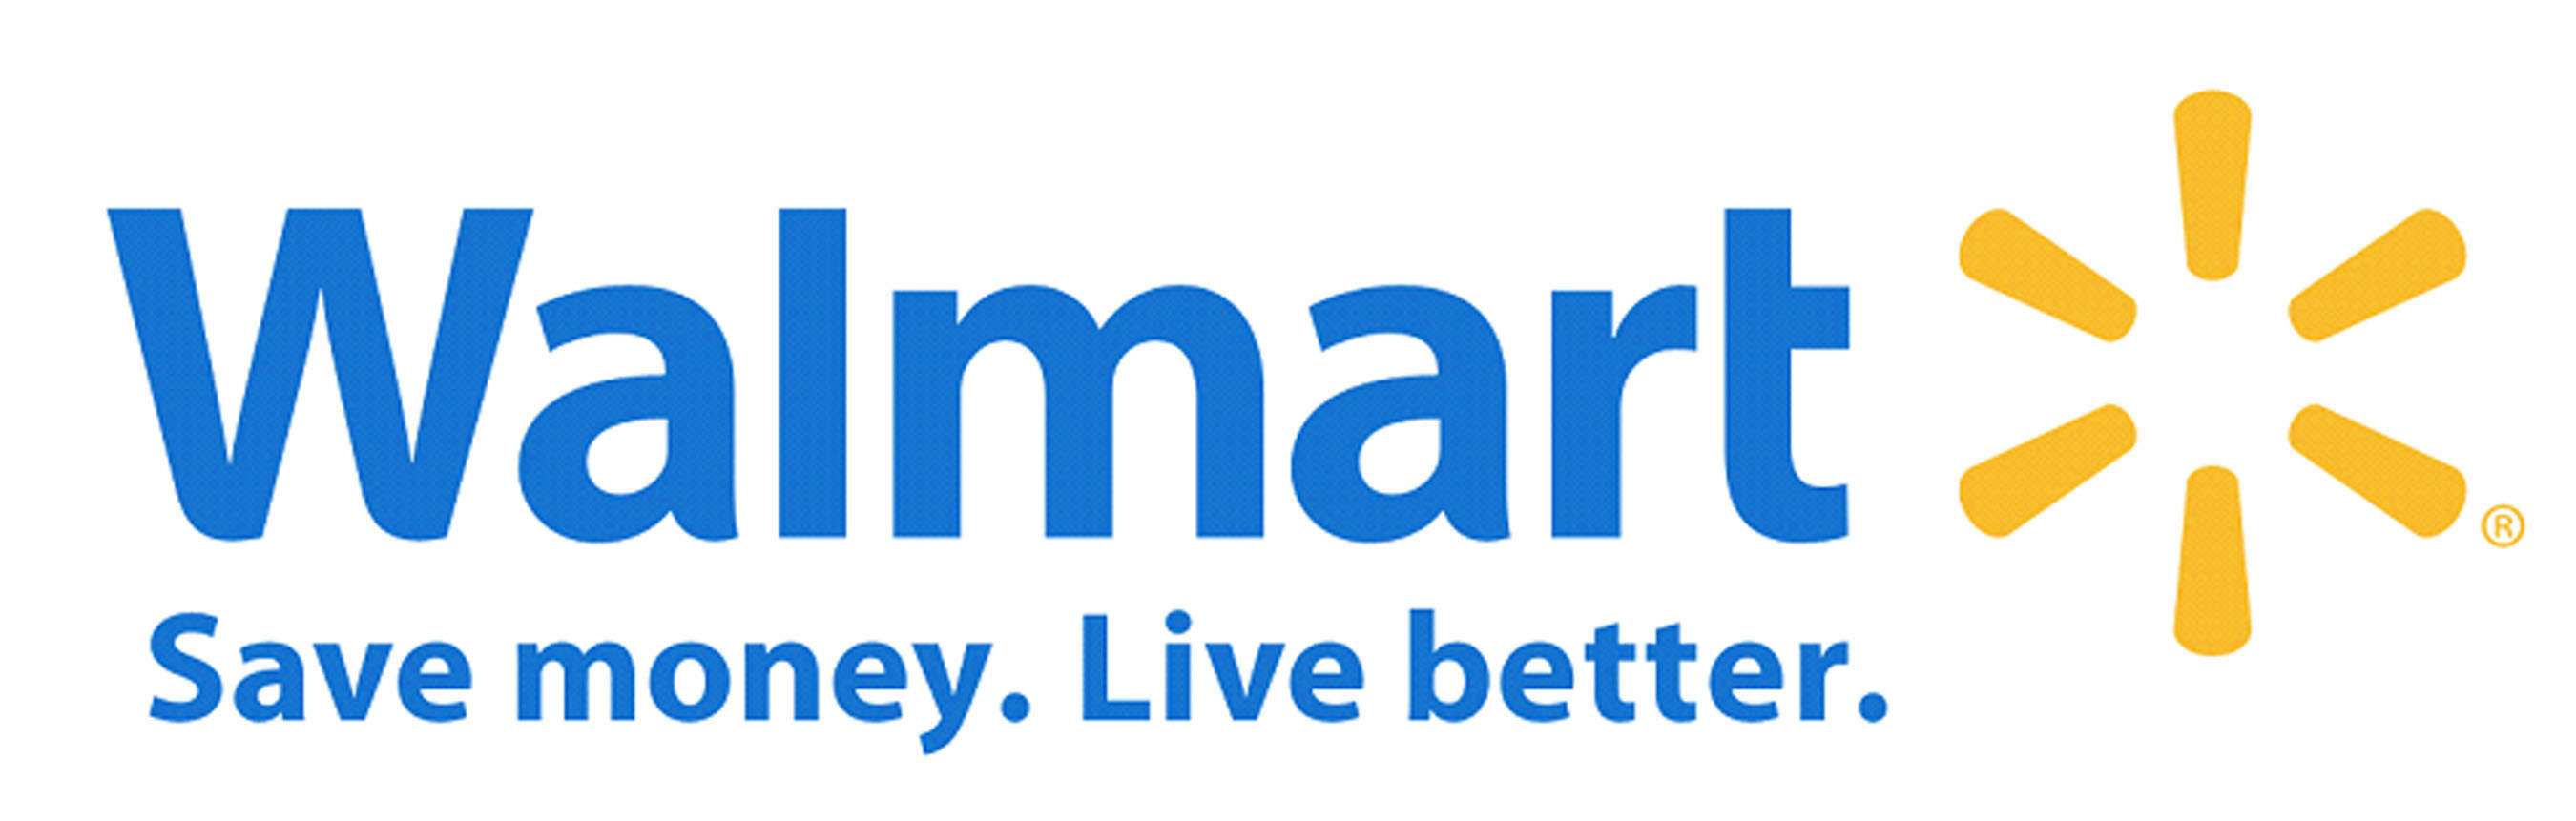 Blue apron ebt - Can I Use My Ebt Card At Walmart